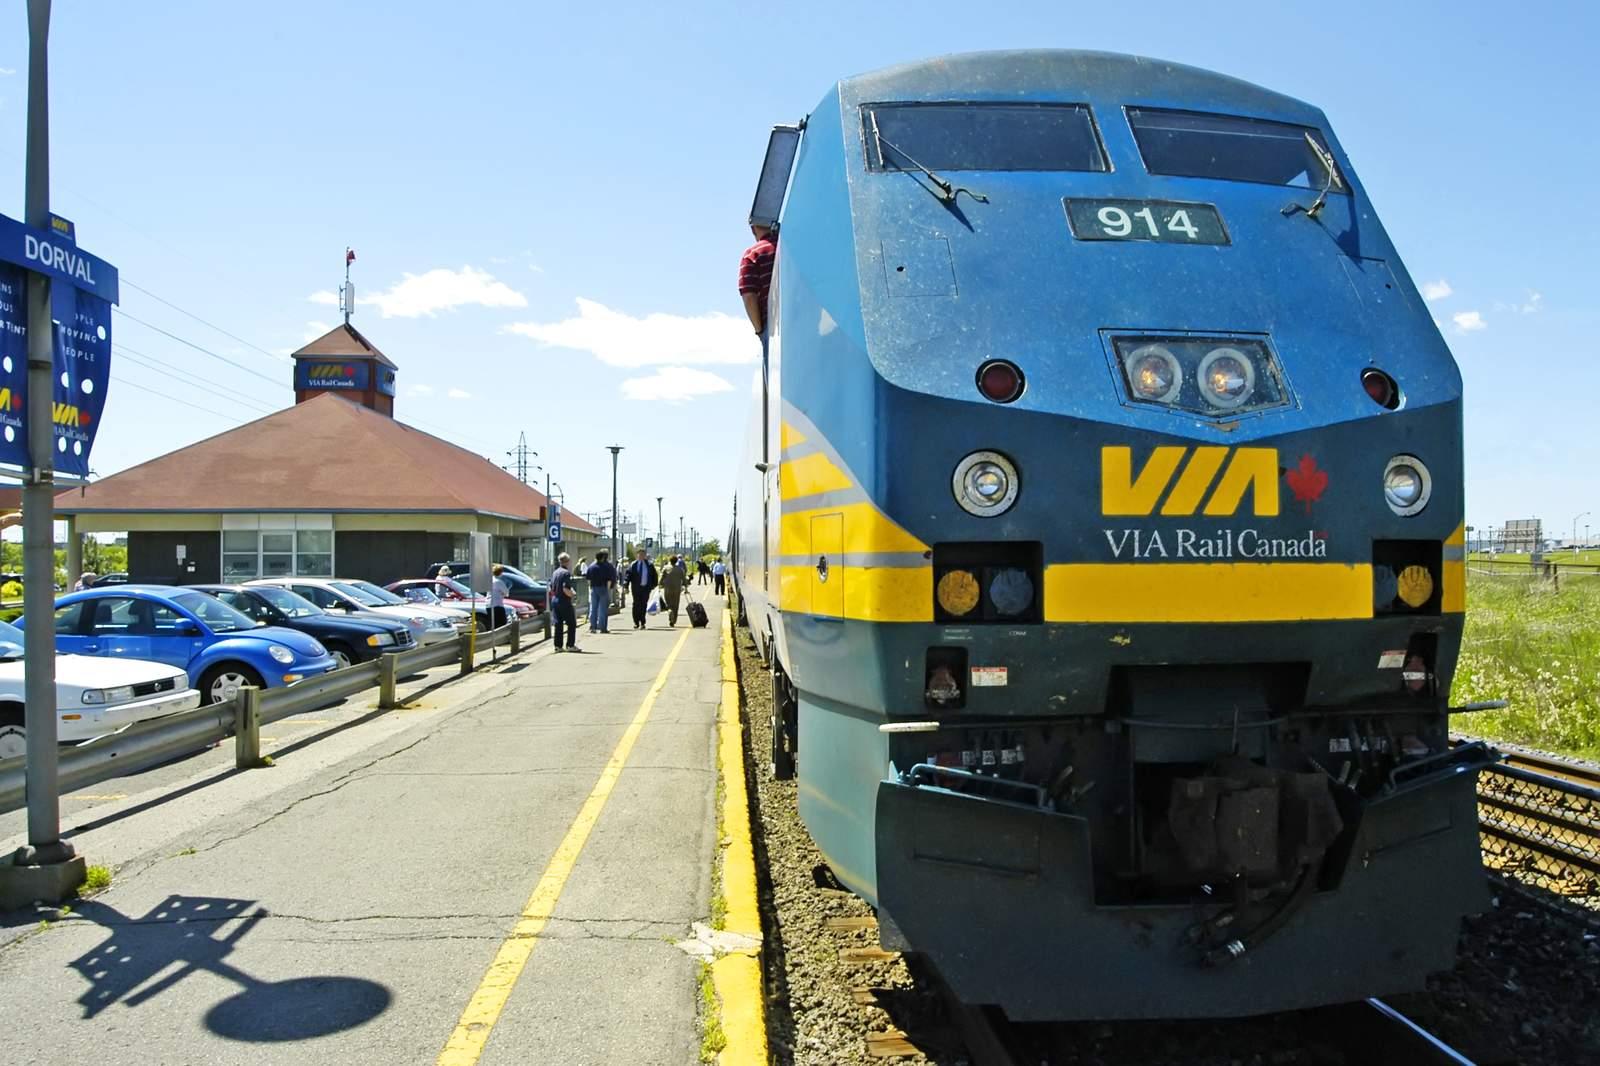 Via Rail Quebec-Windsor